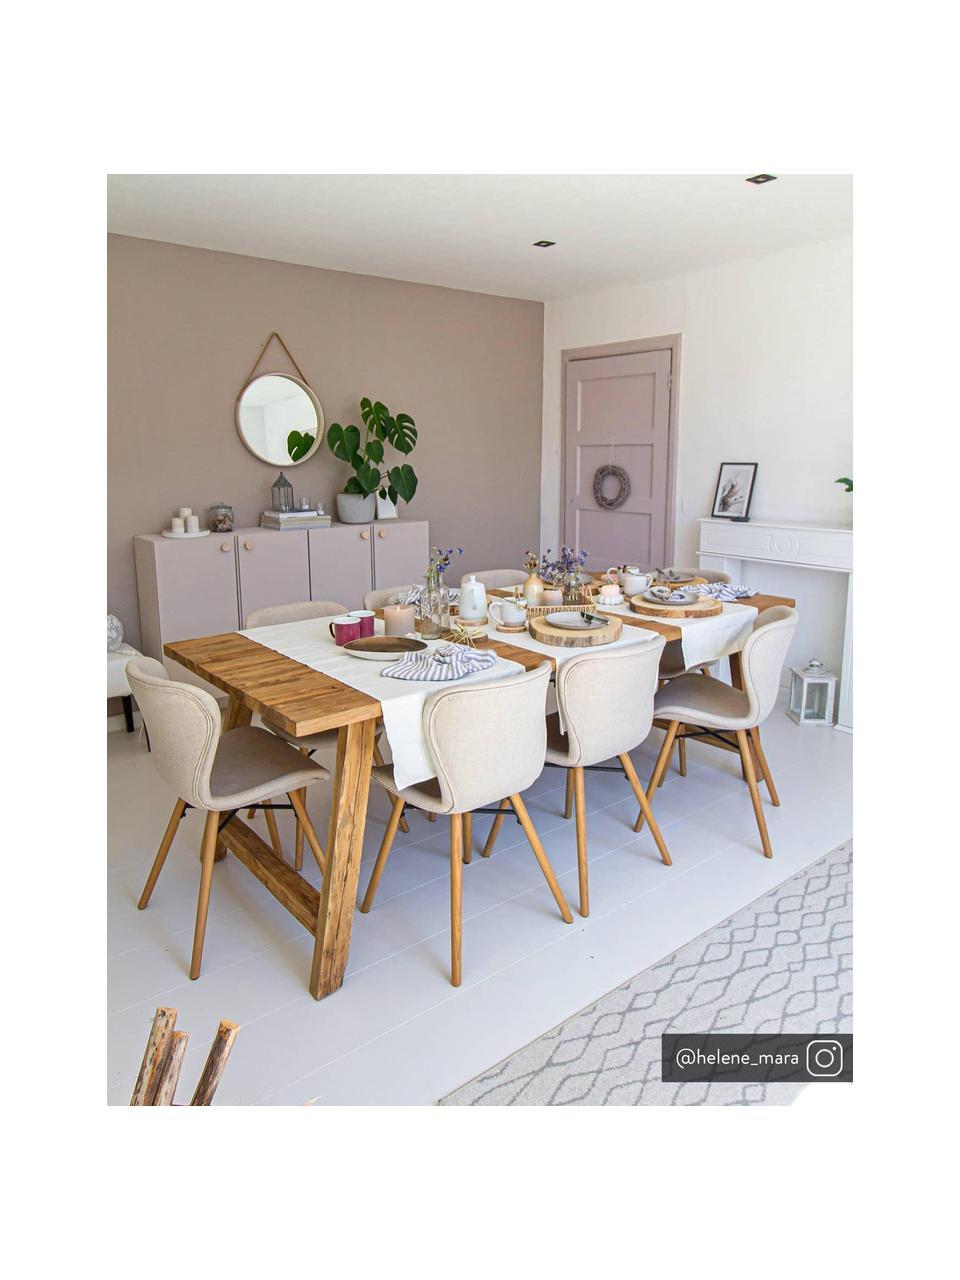 Gestoffeerde stoelen Batilda in zandkleurig, 2 stuks, Bekleding: polyester, Poten: Eikenhout, massief, gelak, Geweven stof zandkleurig, eikenhout, B 56 x D 47 cm